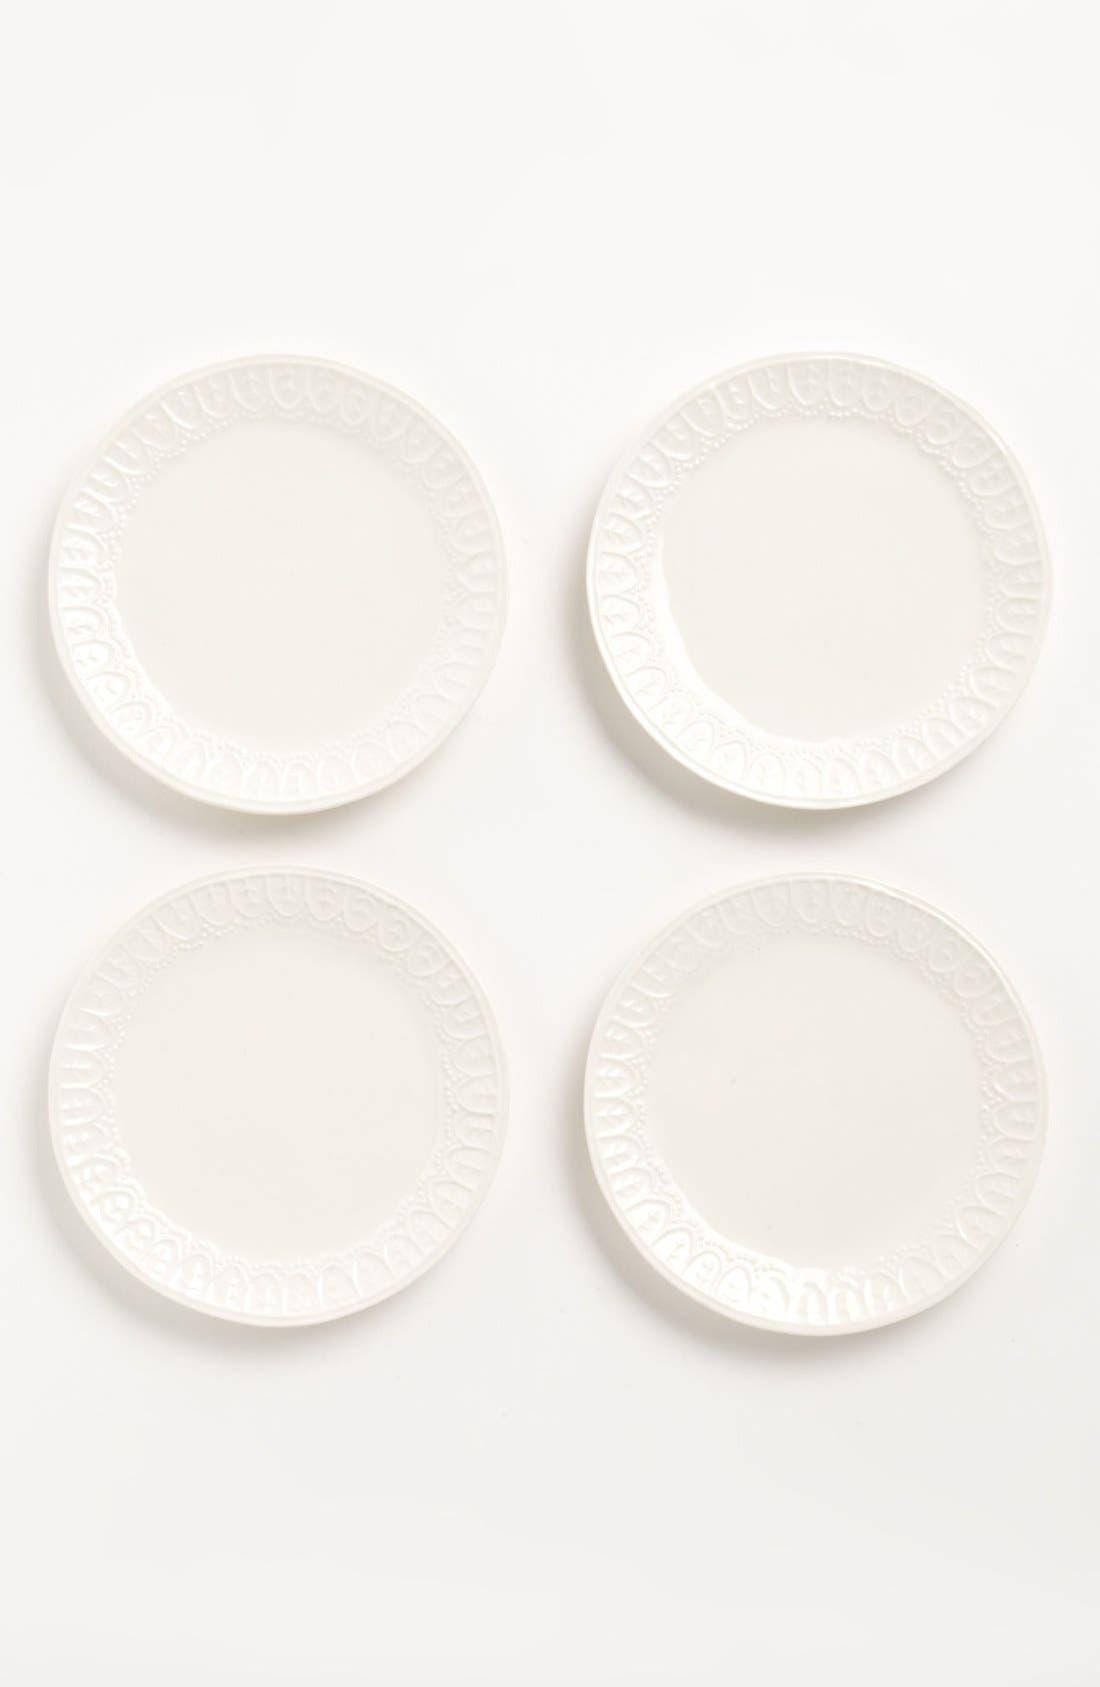 Alternate Image 1 Selected - Magenta 'Bohemian Lace' Salad Plates (Set of 4)